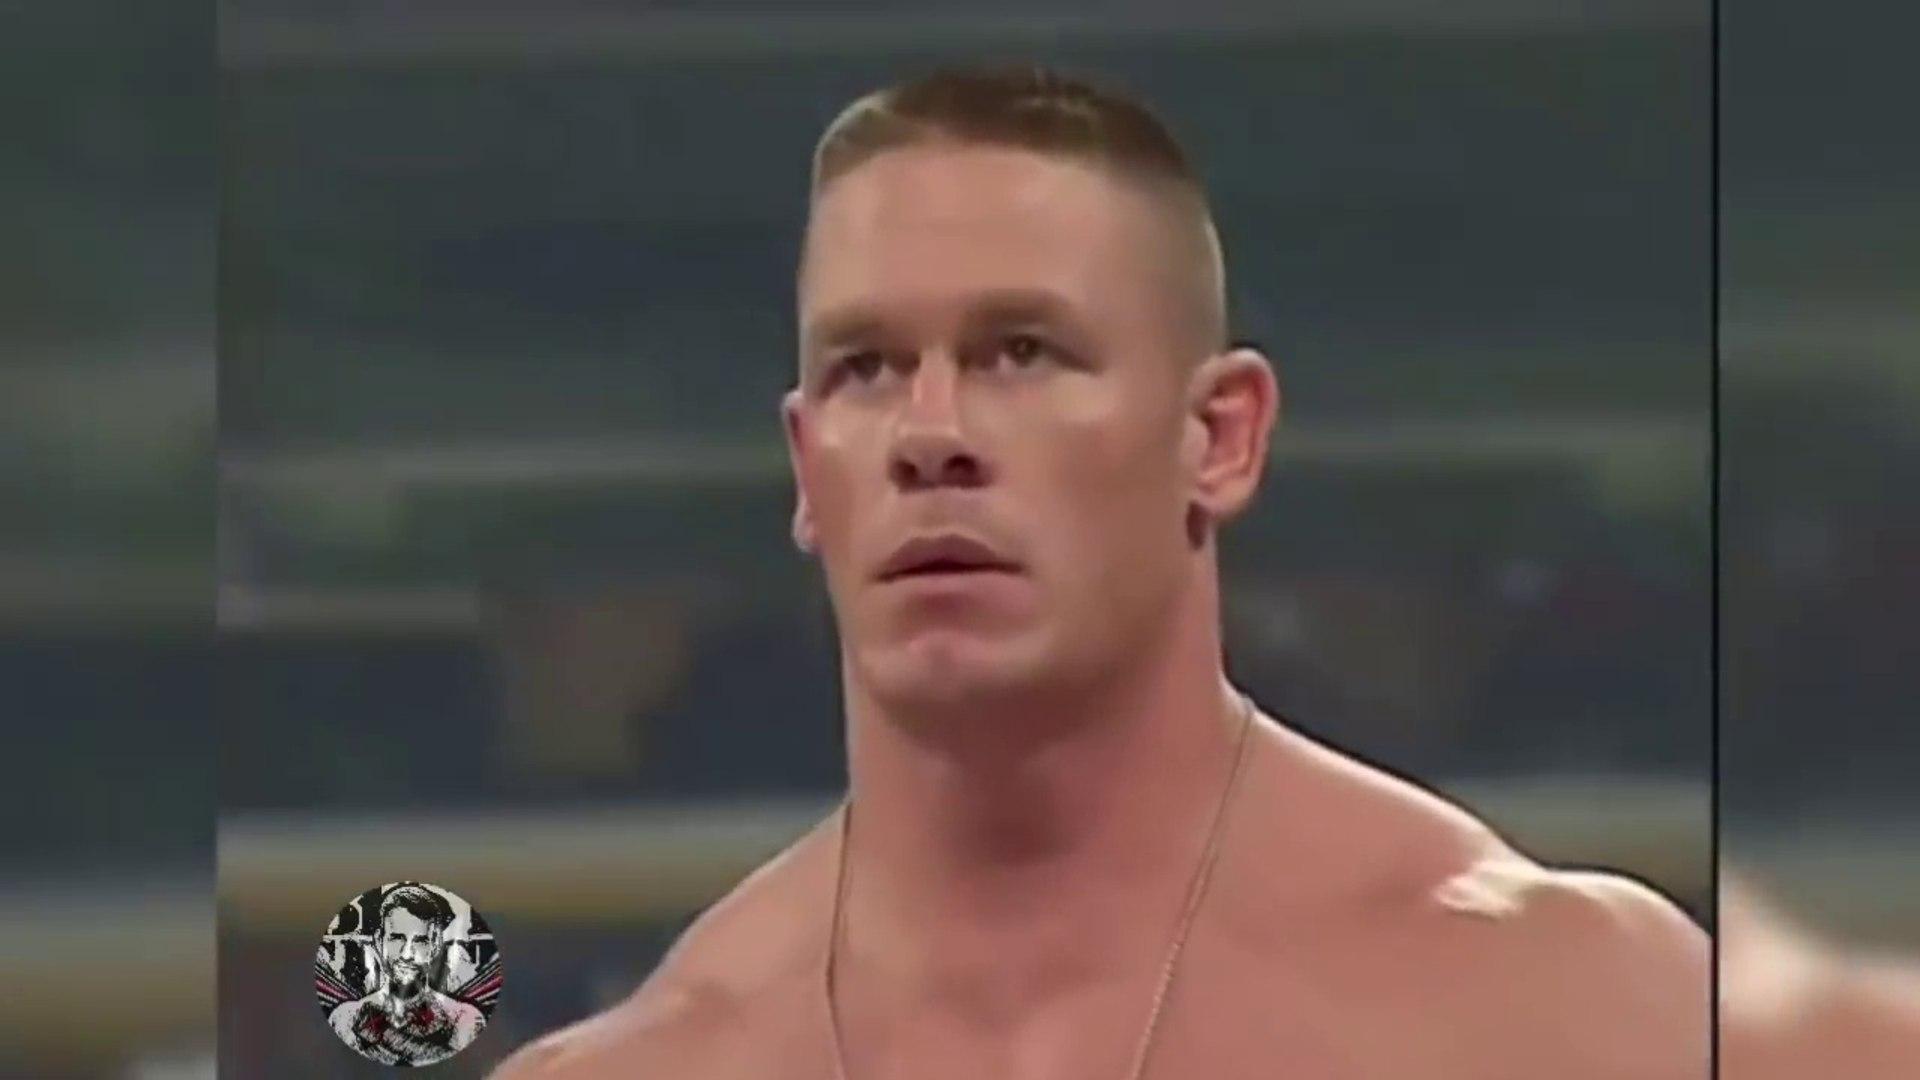 John Cena Vs Great Khali (WWE Championship on the line) جون سينا يواجه اضخم شخص في WWE (كالي) ! by w